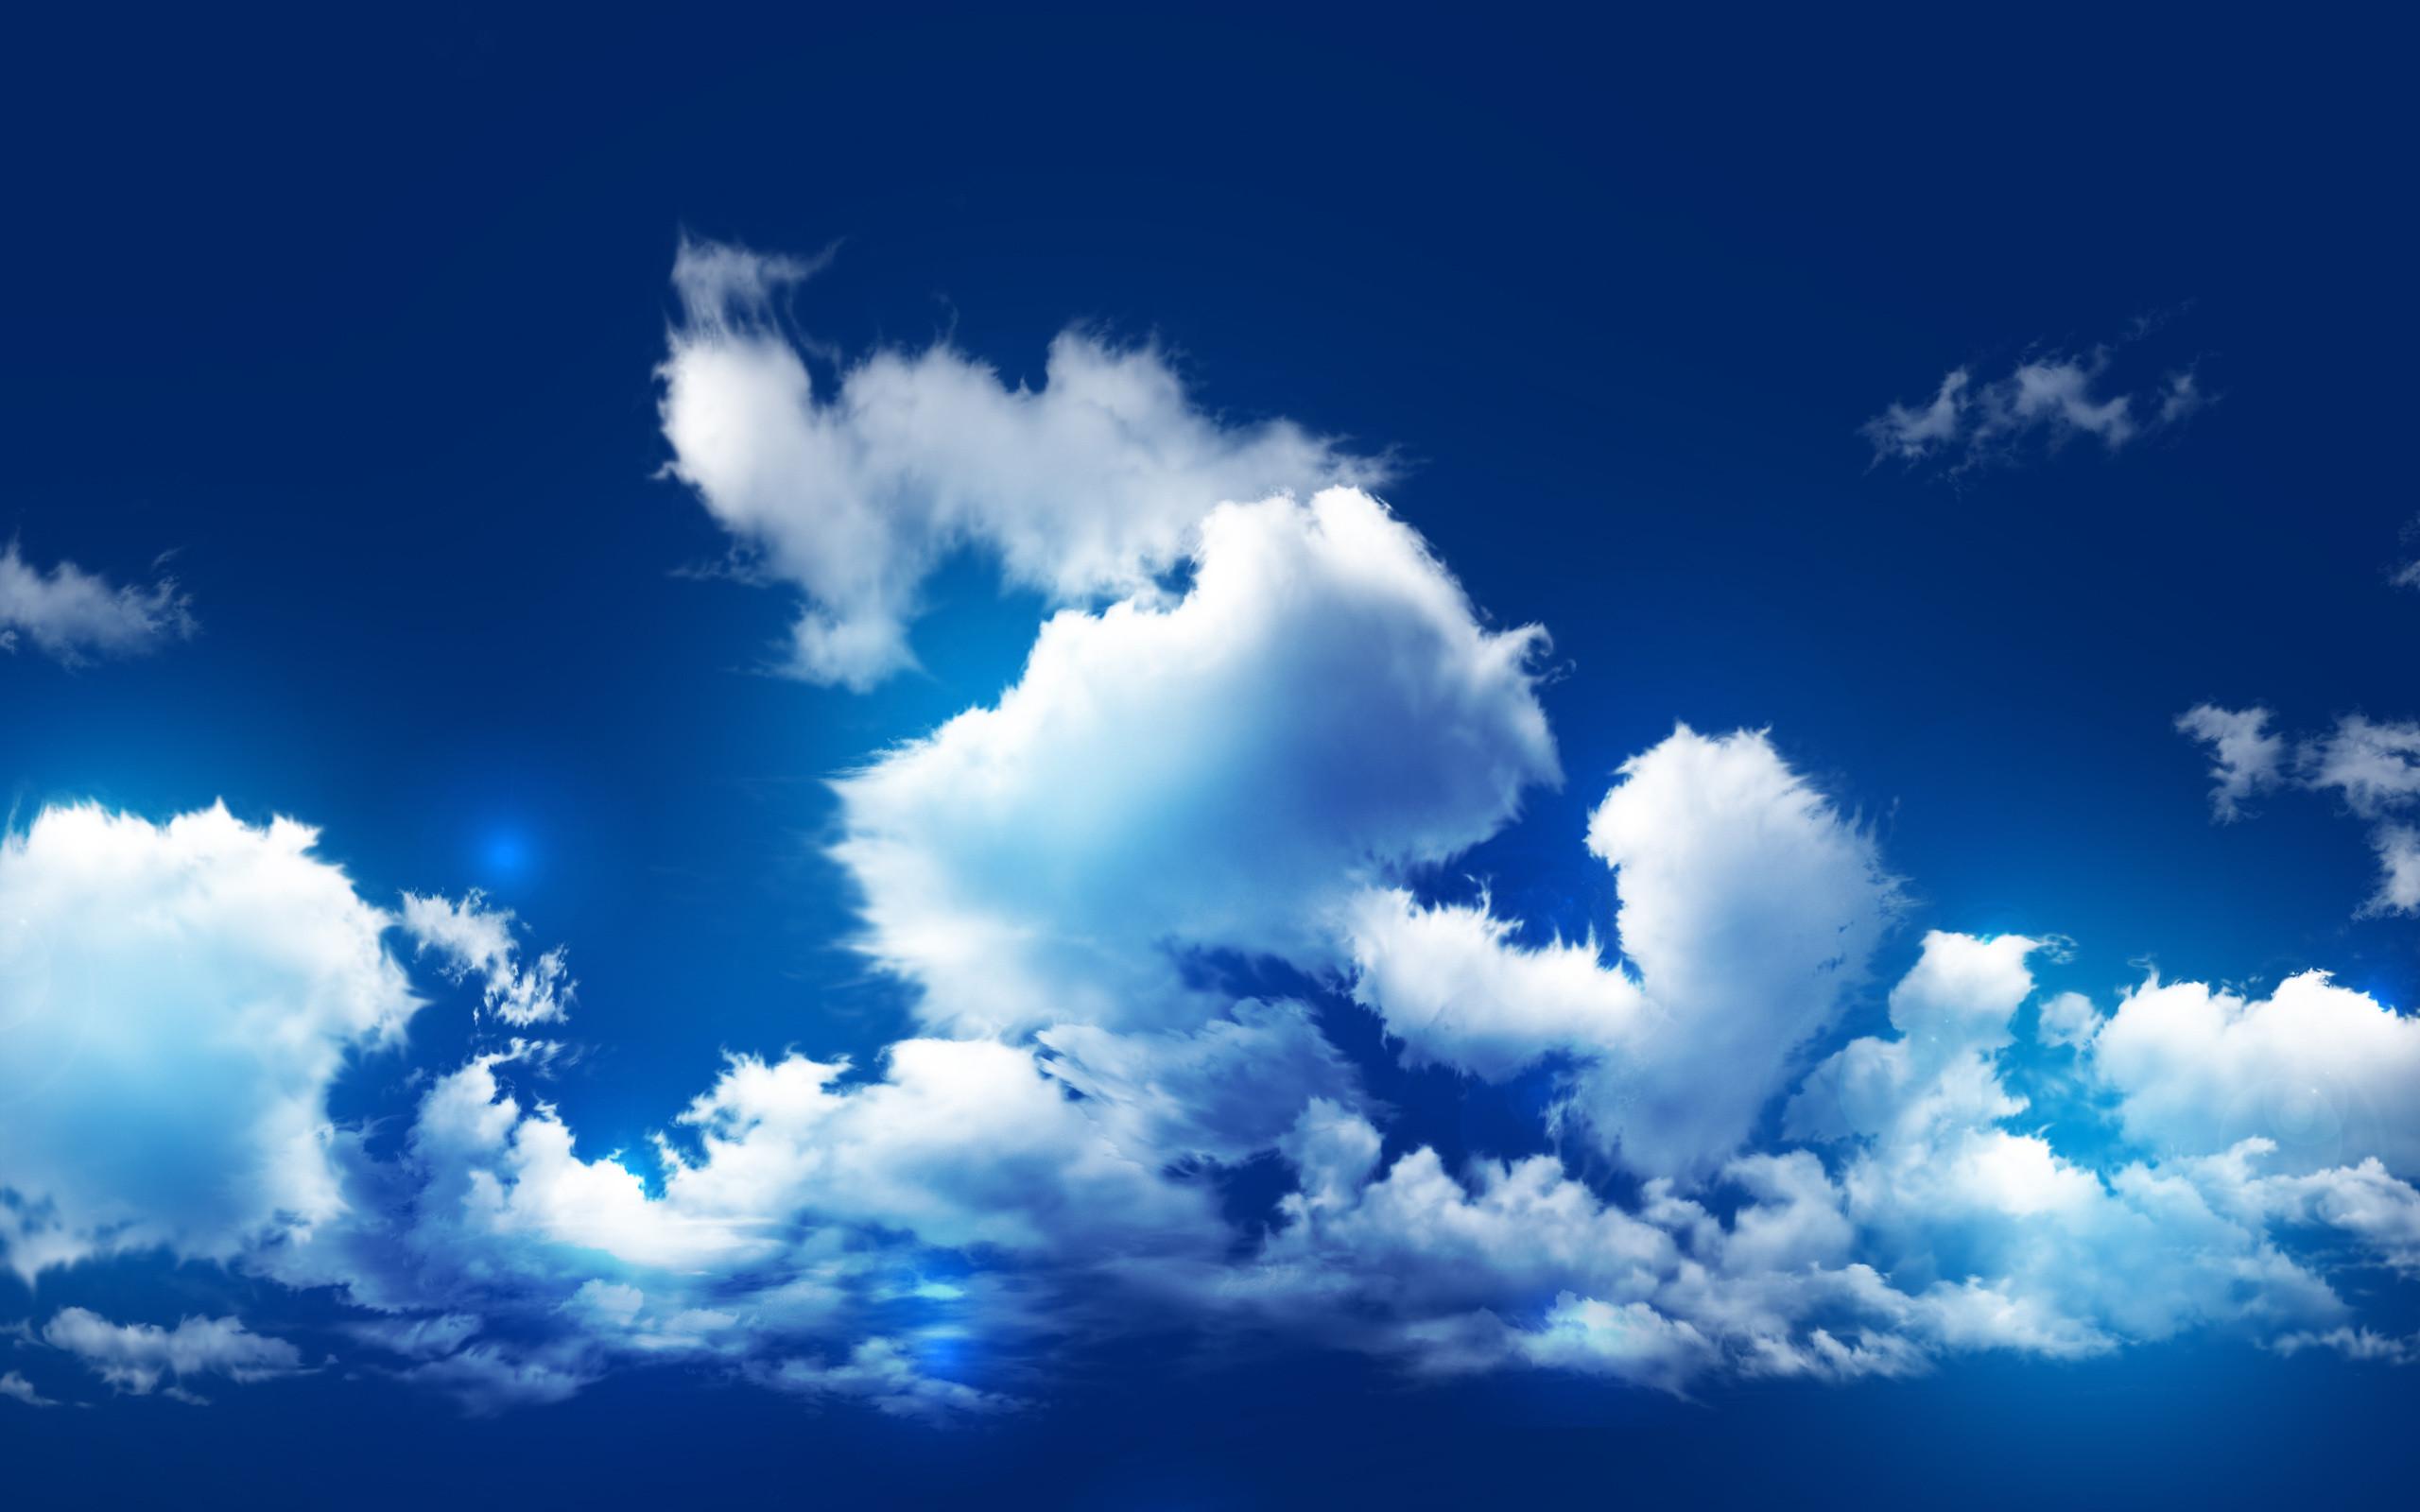 Preview Sky Wallpaper · Cloud WallpaperNature WallpaperBlue …